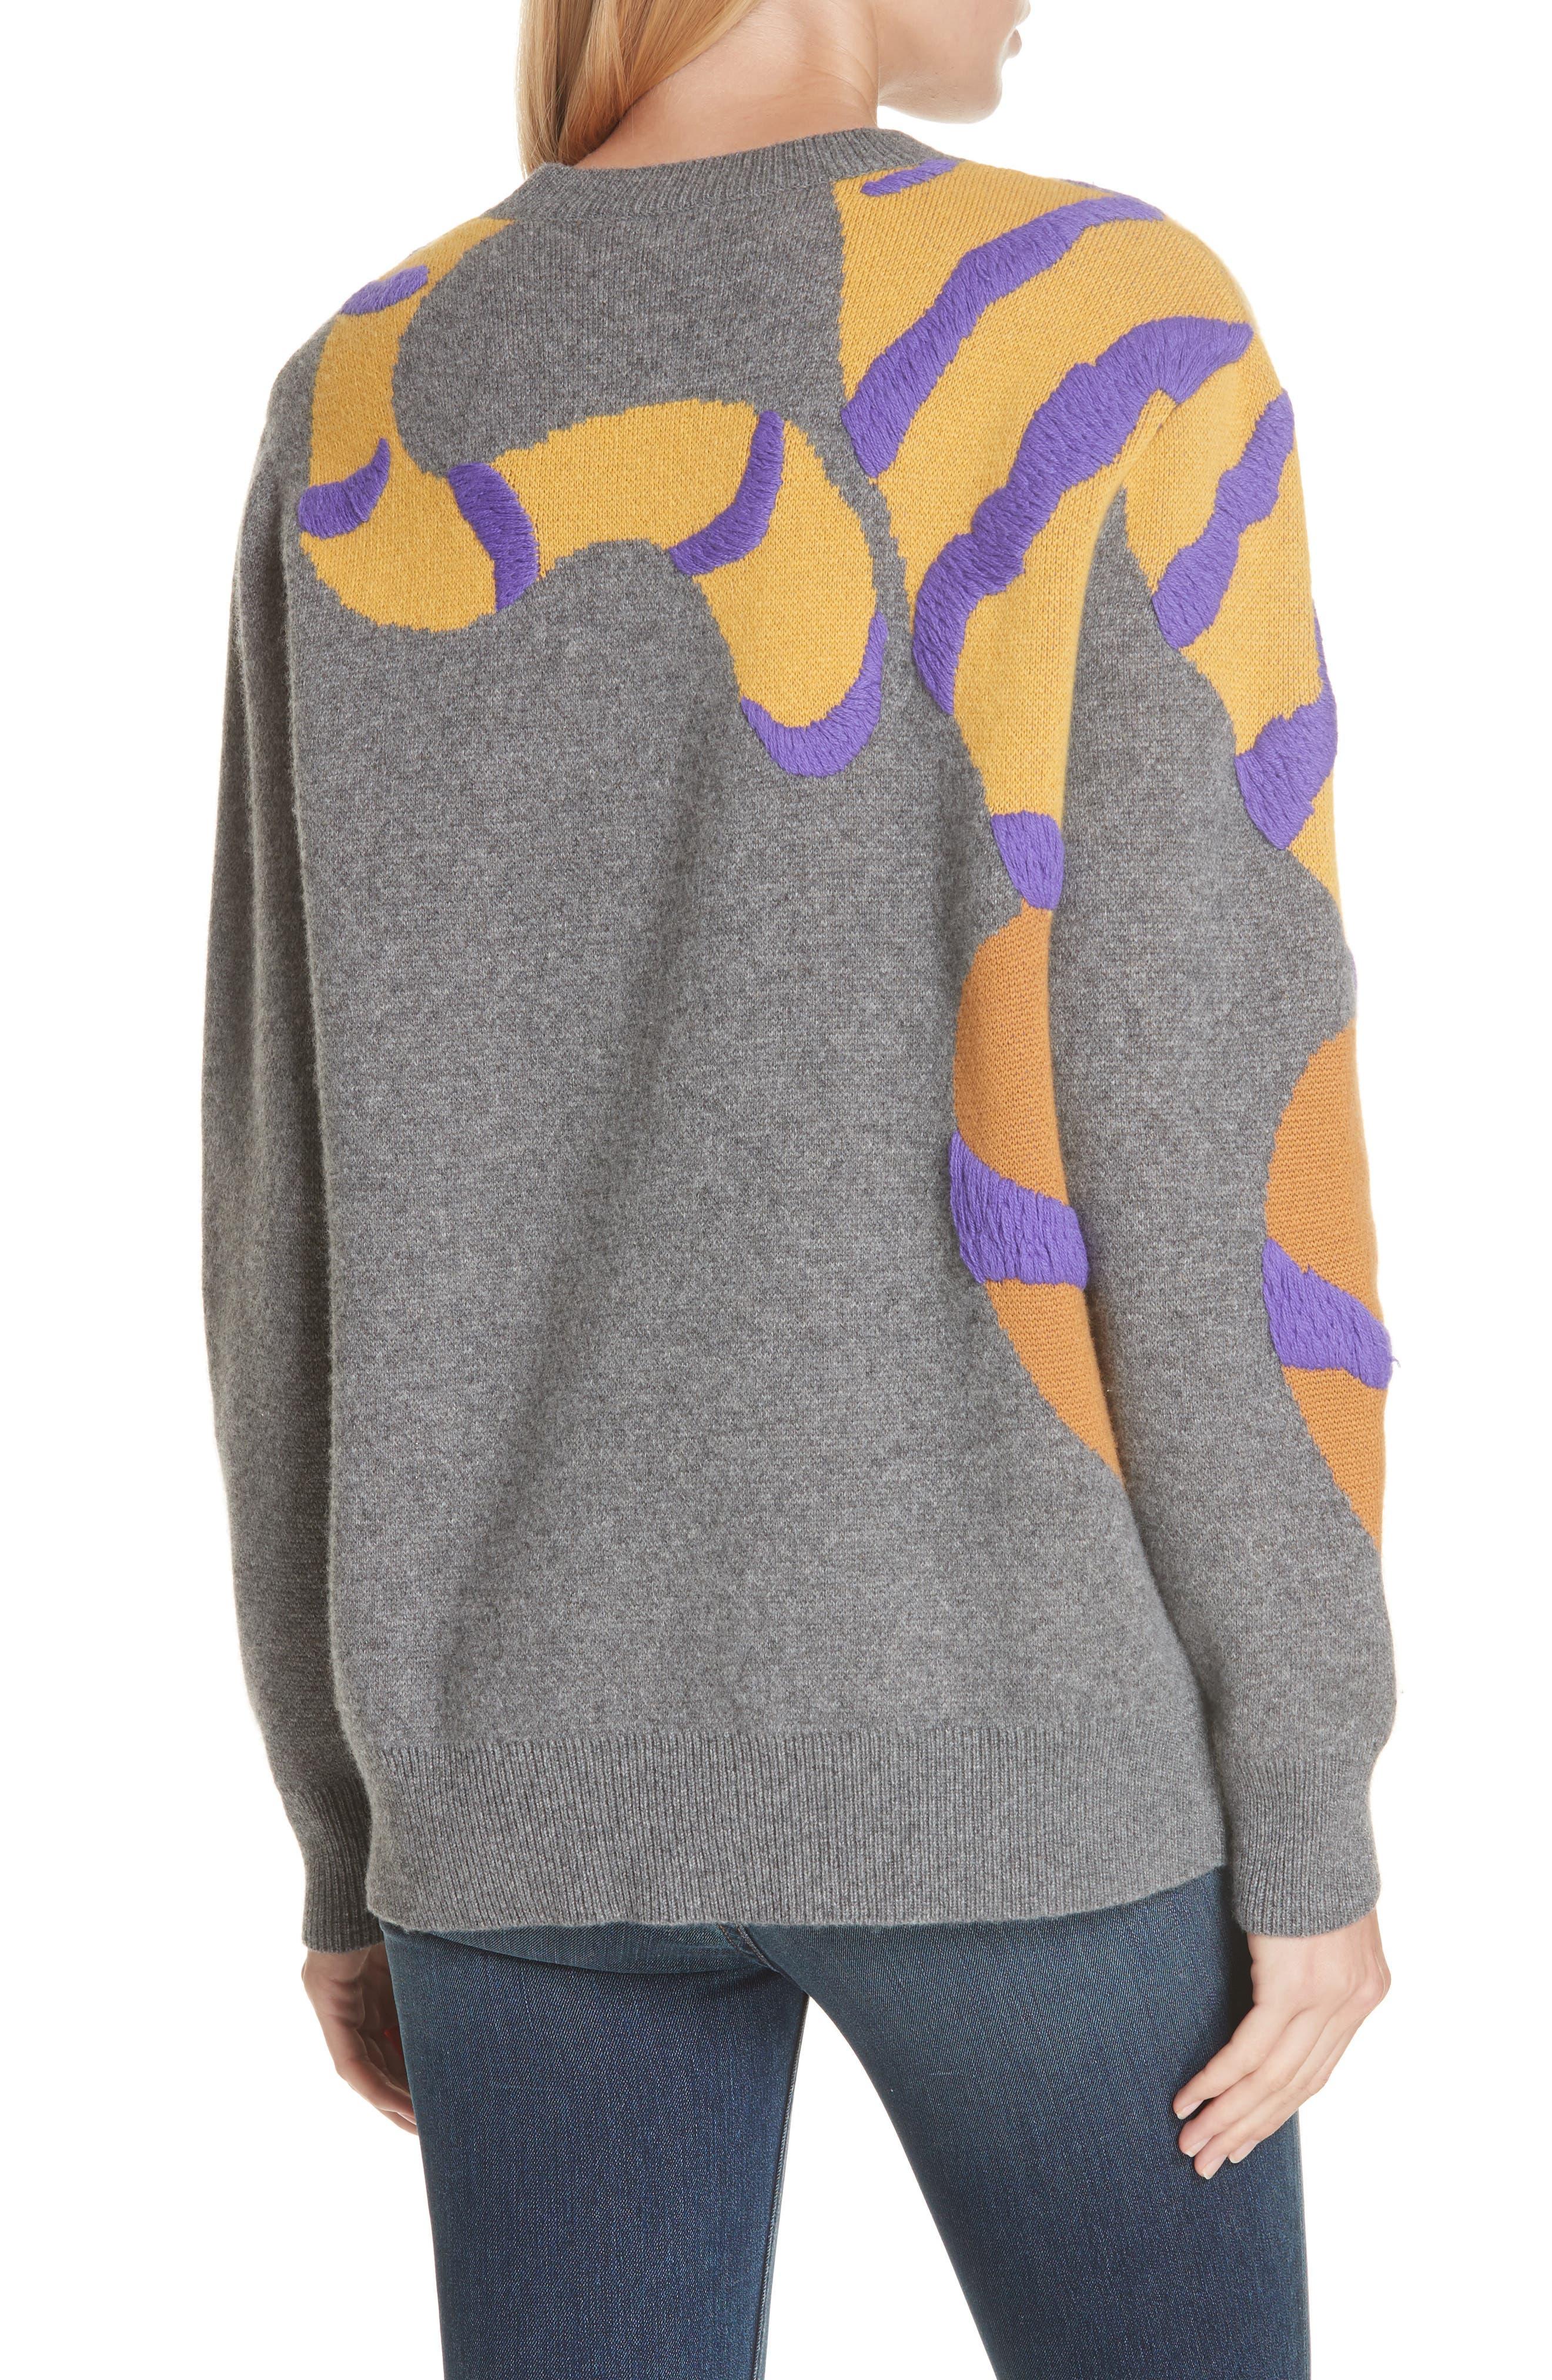 RAG & BONE,                             Tiger Cashmere Sweater,                             Alternate thumbnail 2, color,                             CHARCOAL